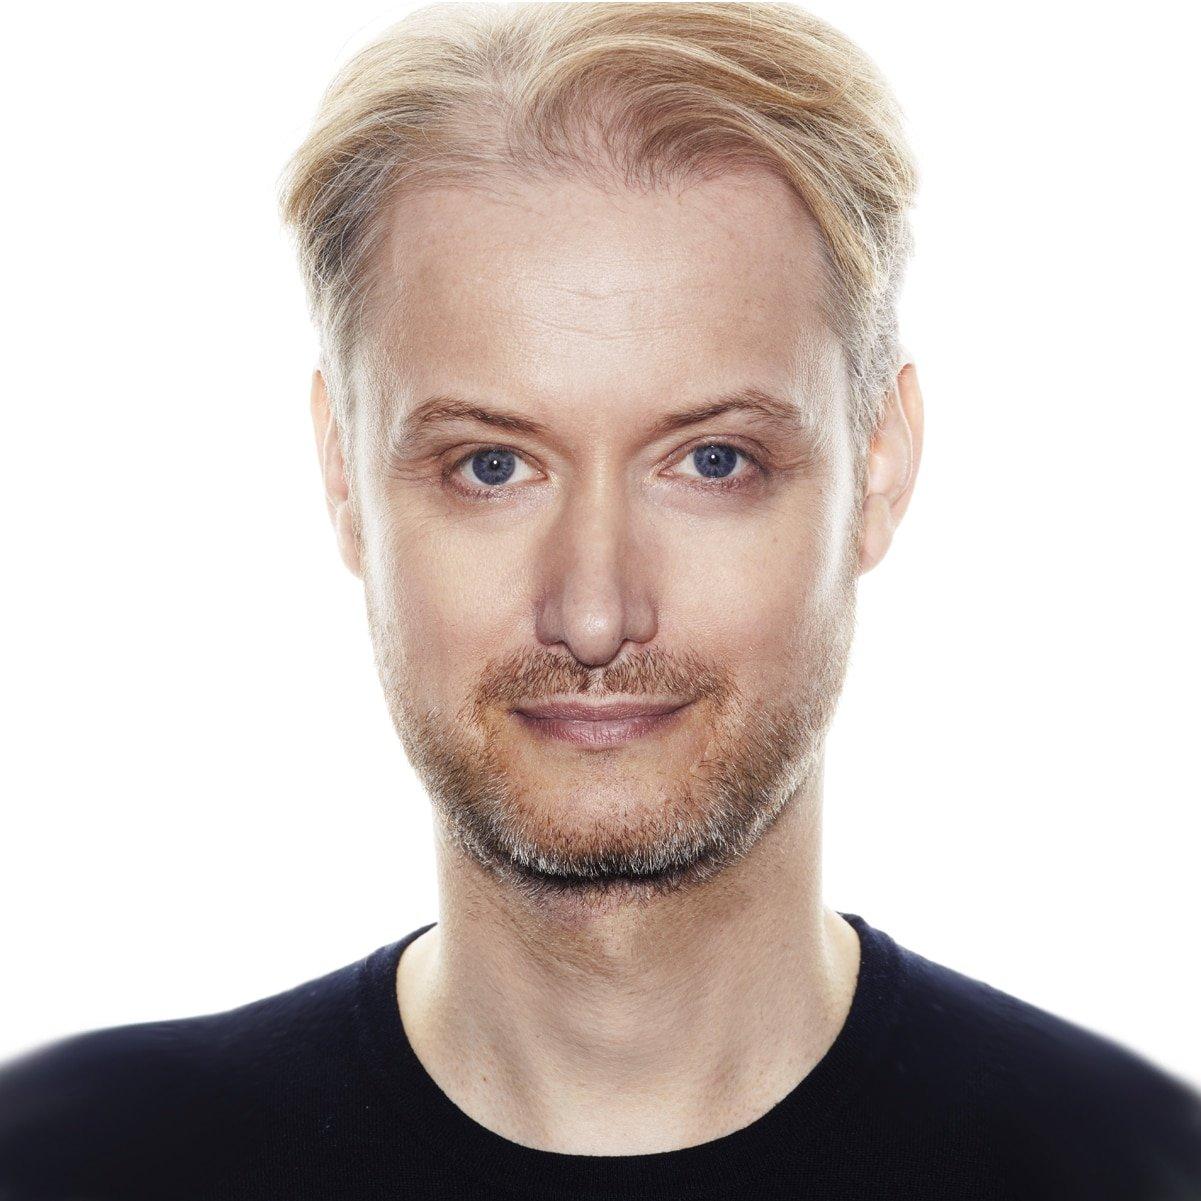 Stuart-Miles-former-Blue-Peter-award-winning-radio-TV-broadcaster-speaker-host-at-Great-British-Speakers